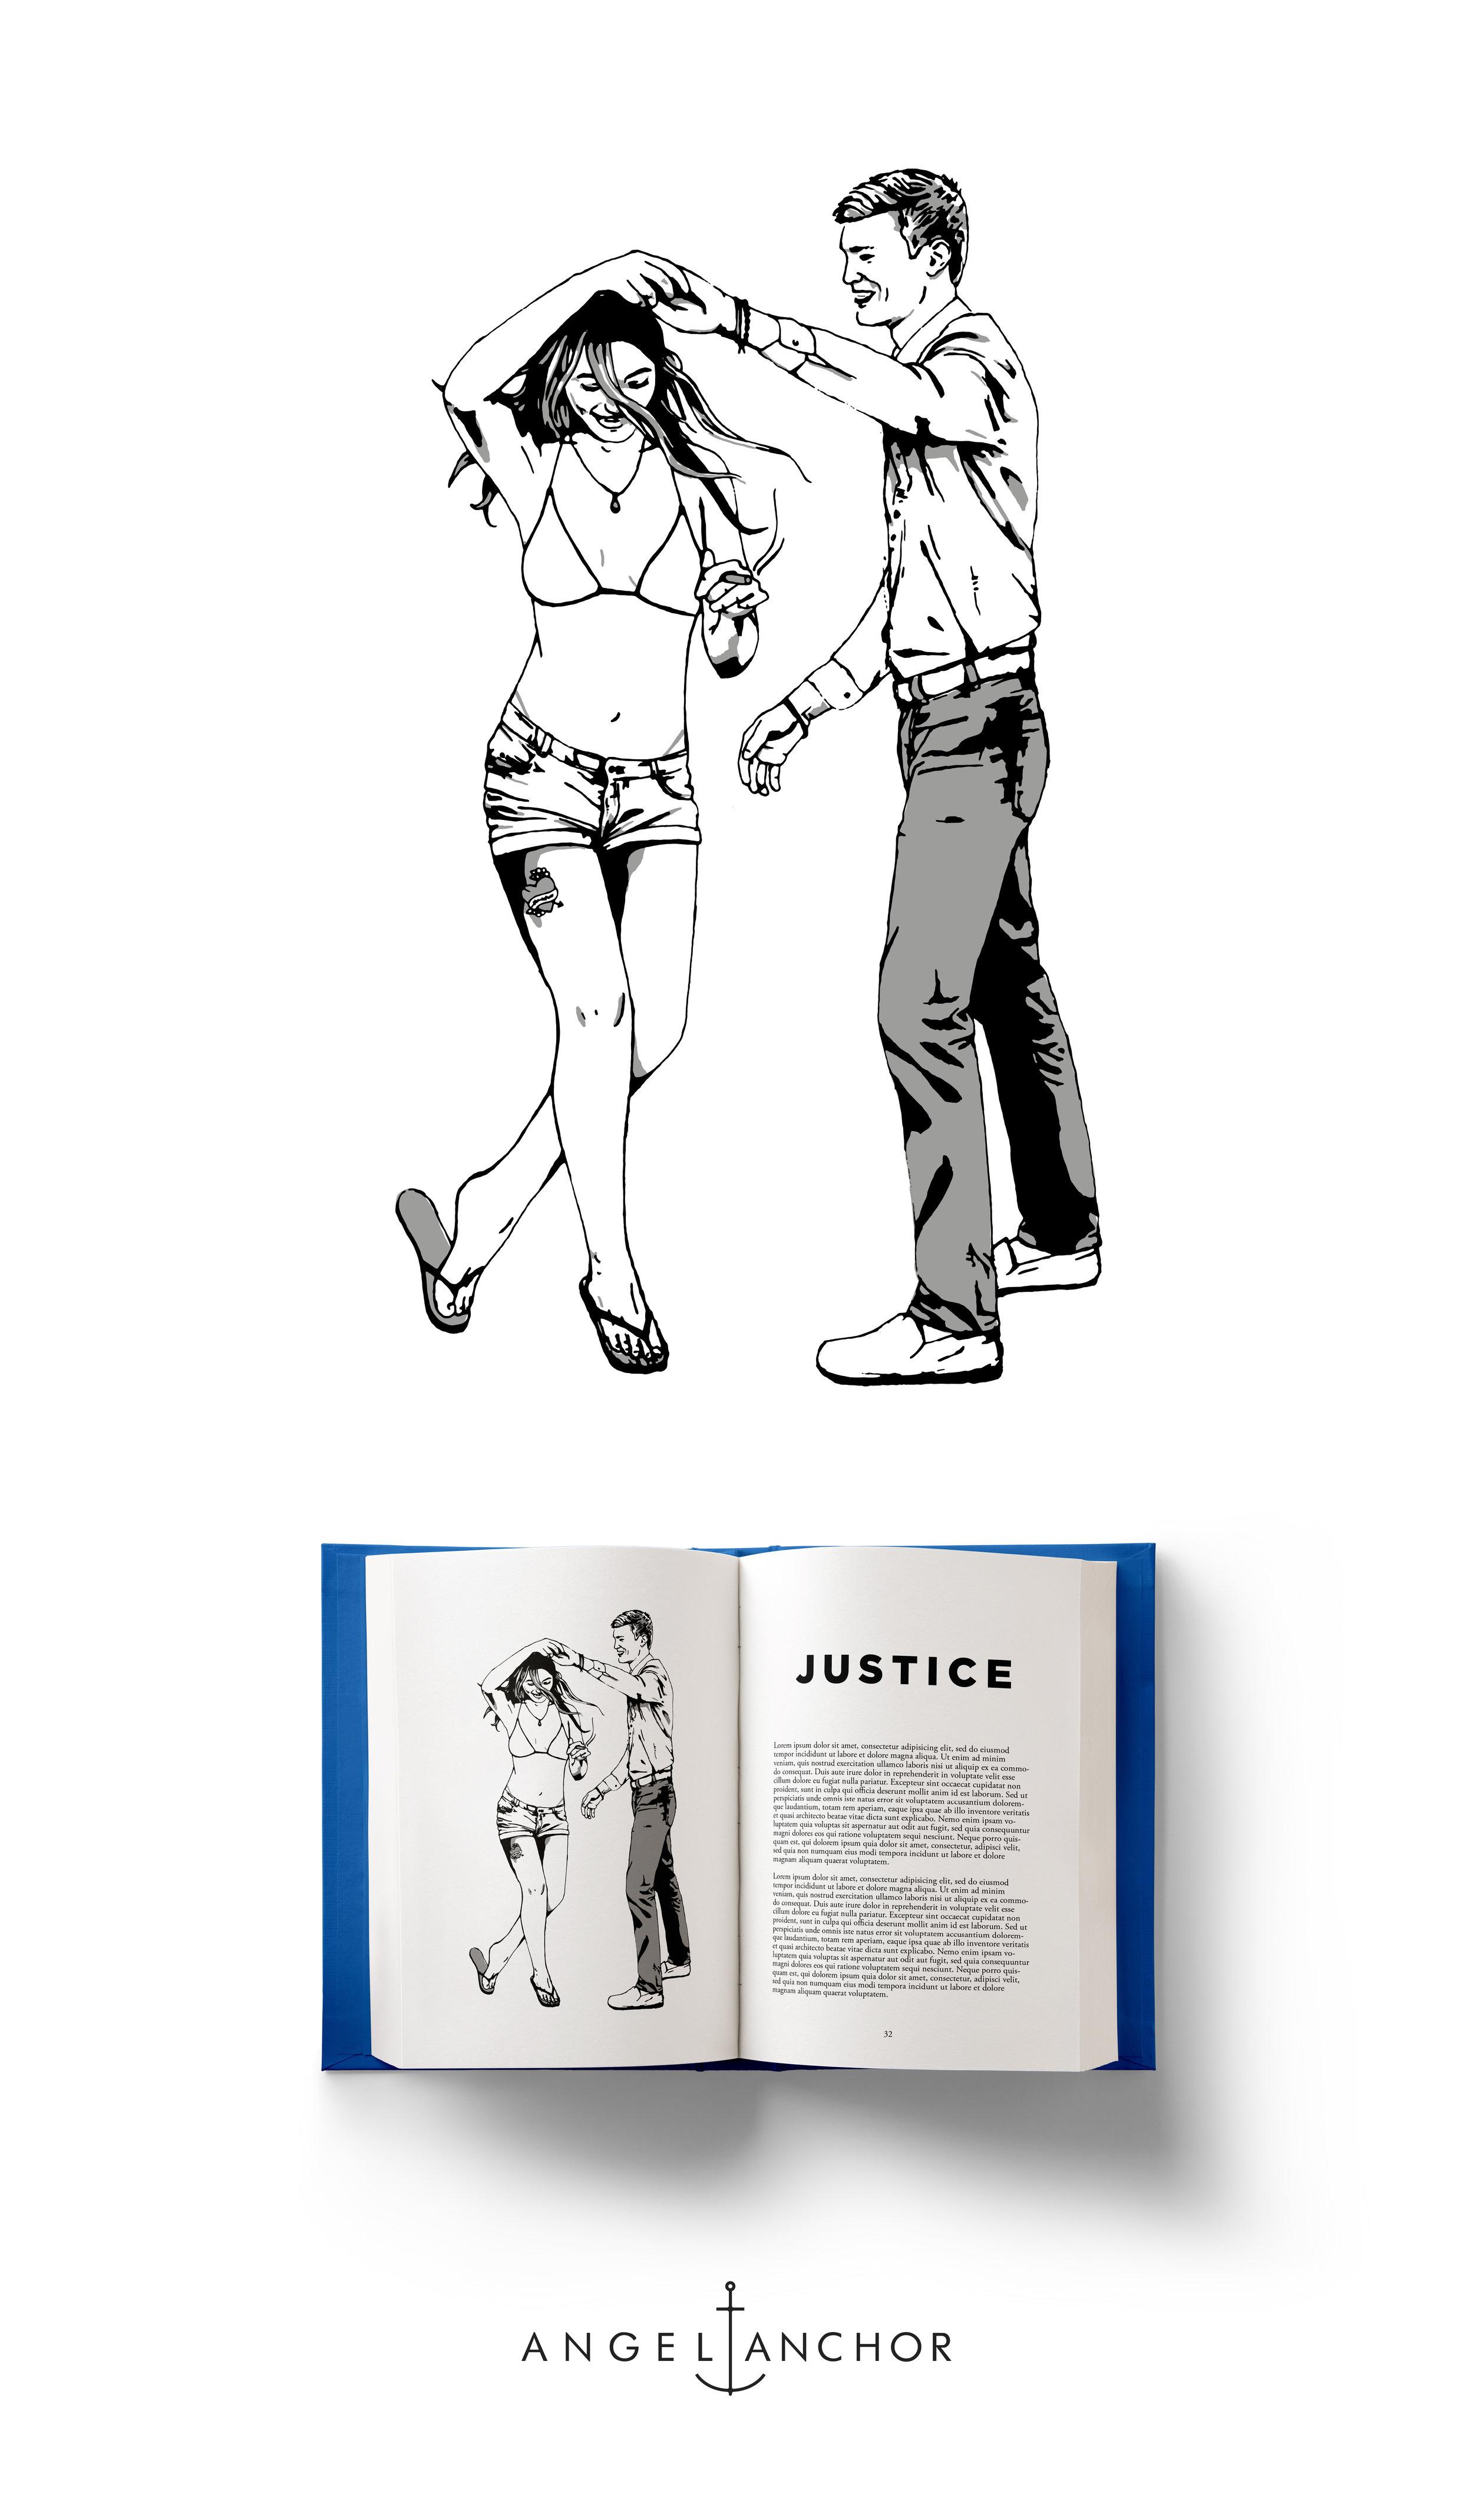 #4 - JUSTICE